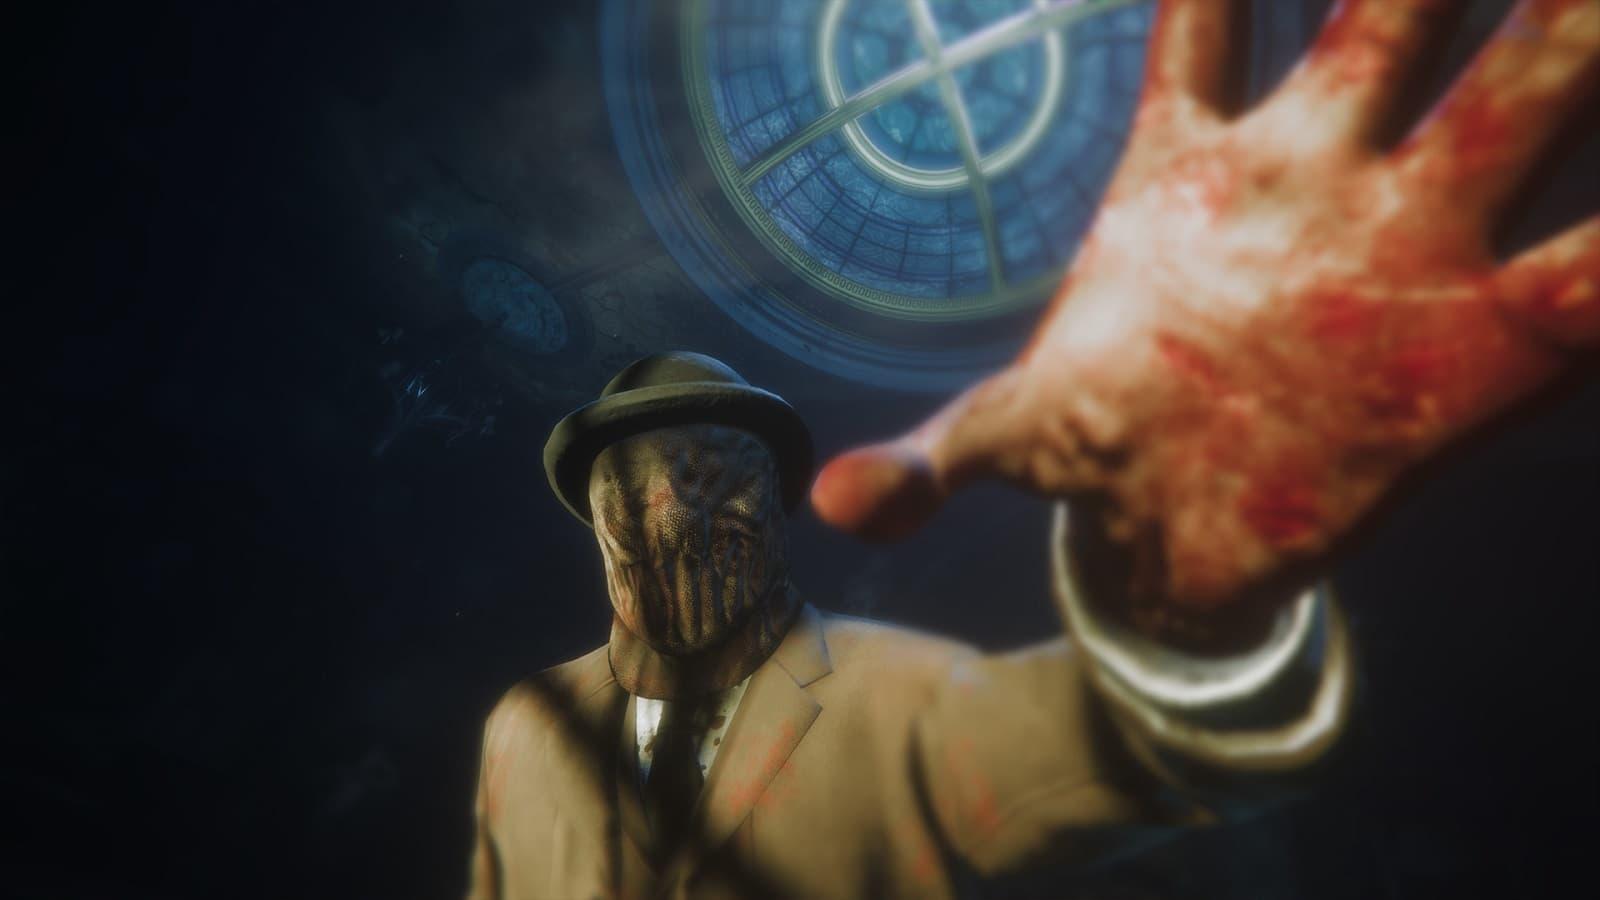 Рецензия на игру Maid of Sker - готический клон ремейка Resident Evil 2 с примесью Amnesia - 03